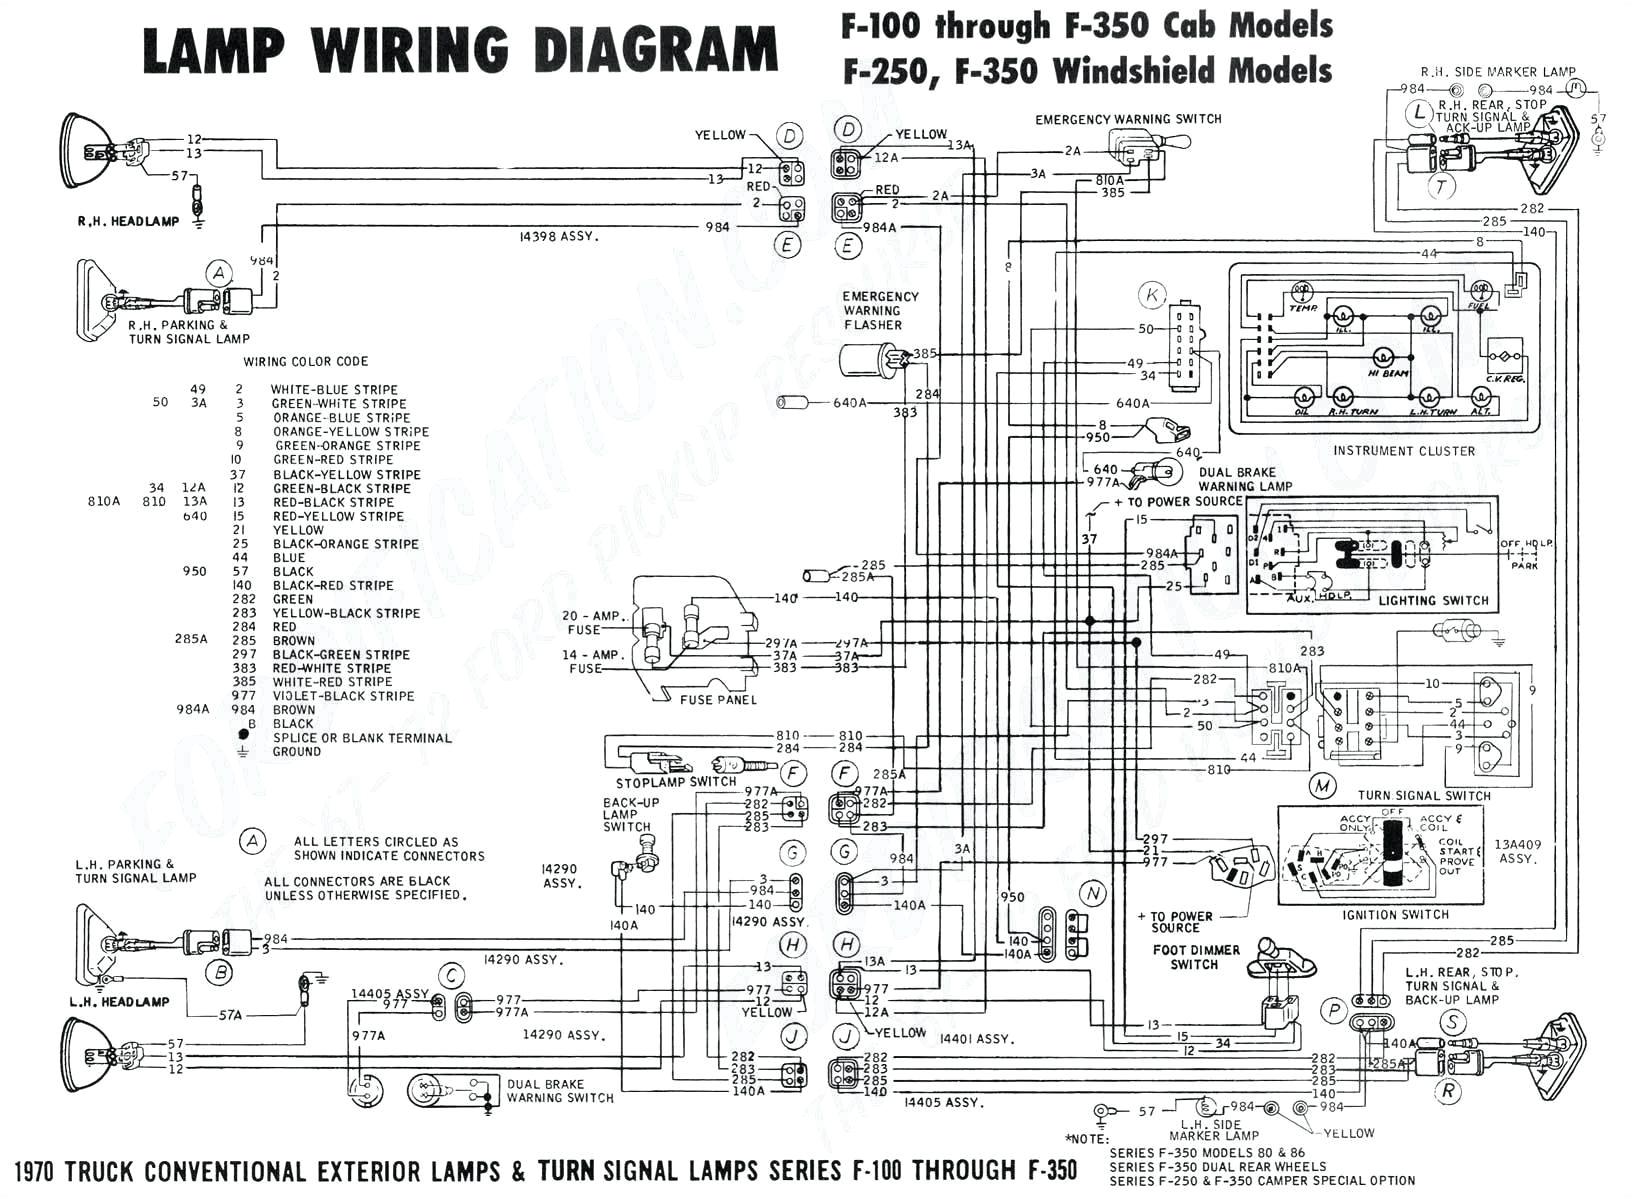 wiring diagram also 24 volt system diagram on mack sel engine 1938 buick wiring diagram schematic